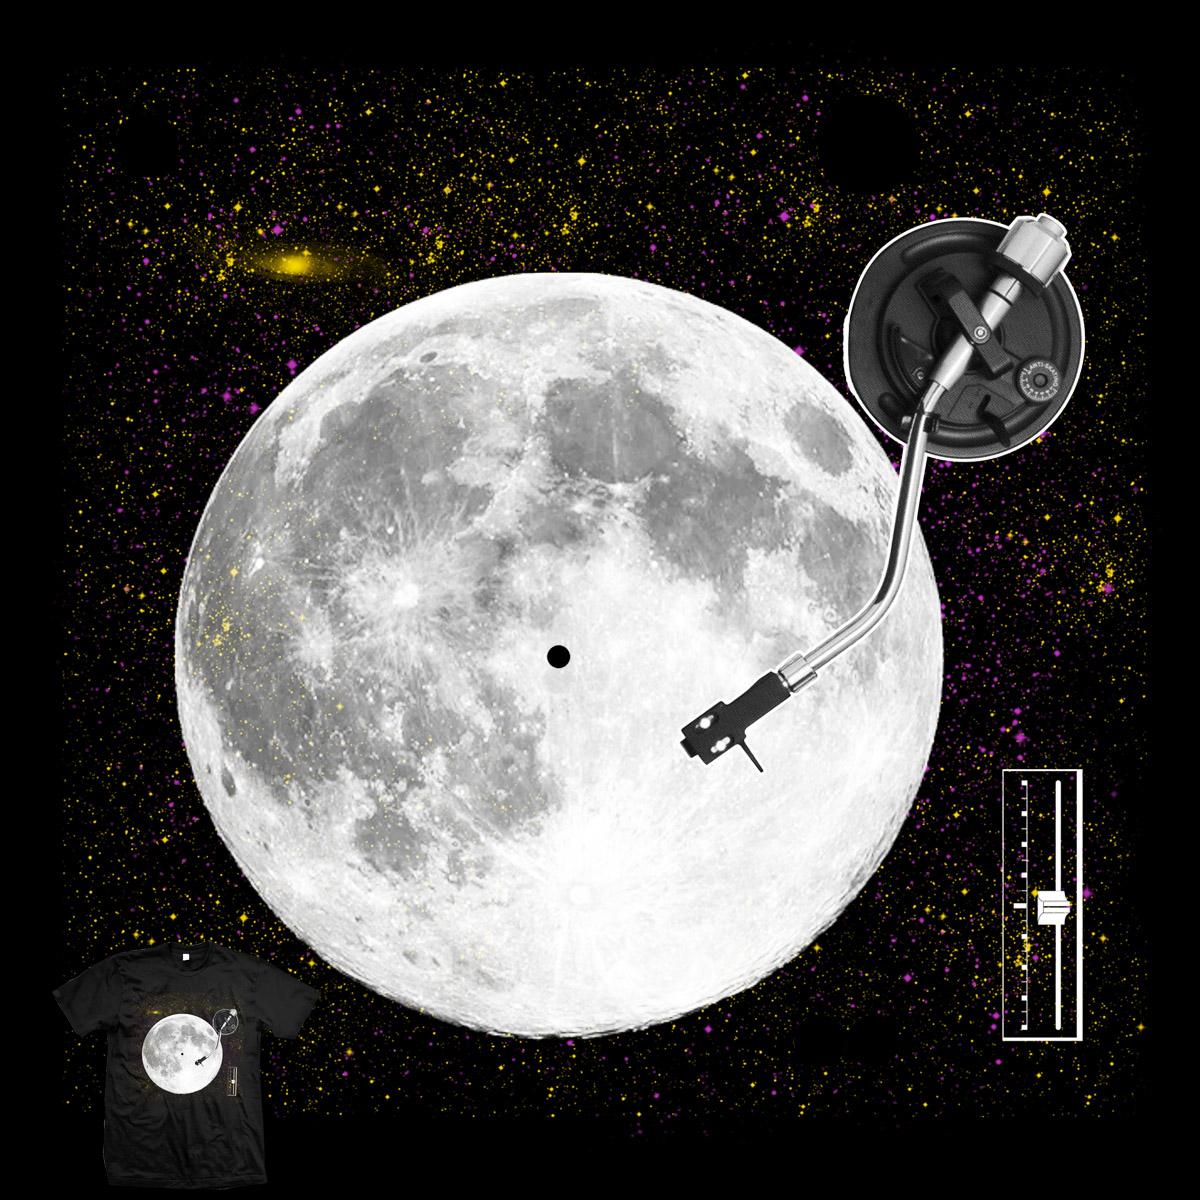 Moon Songs by mainial on Threadless